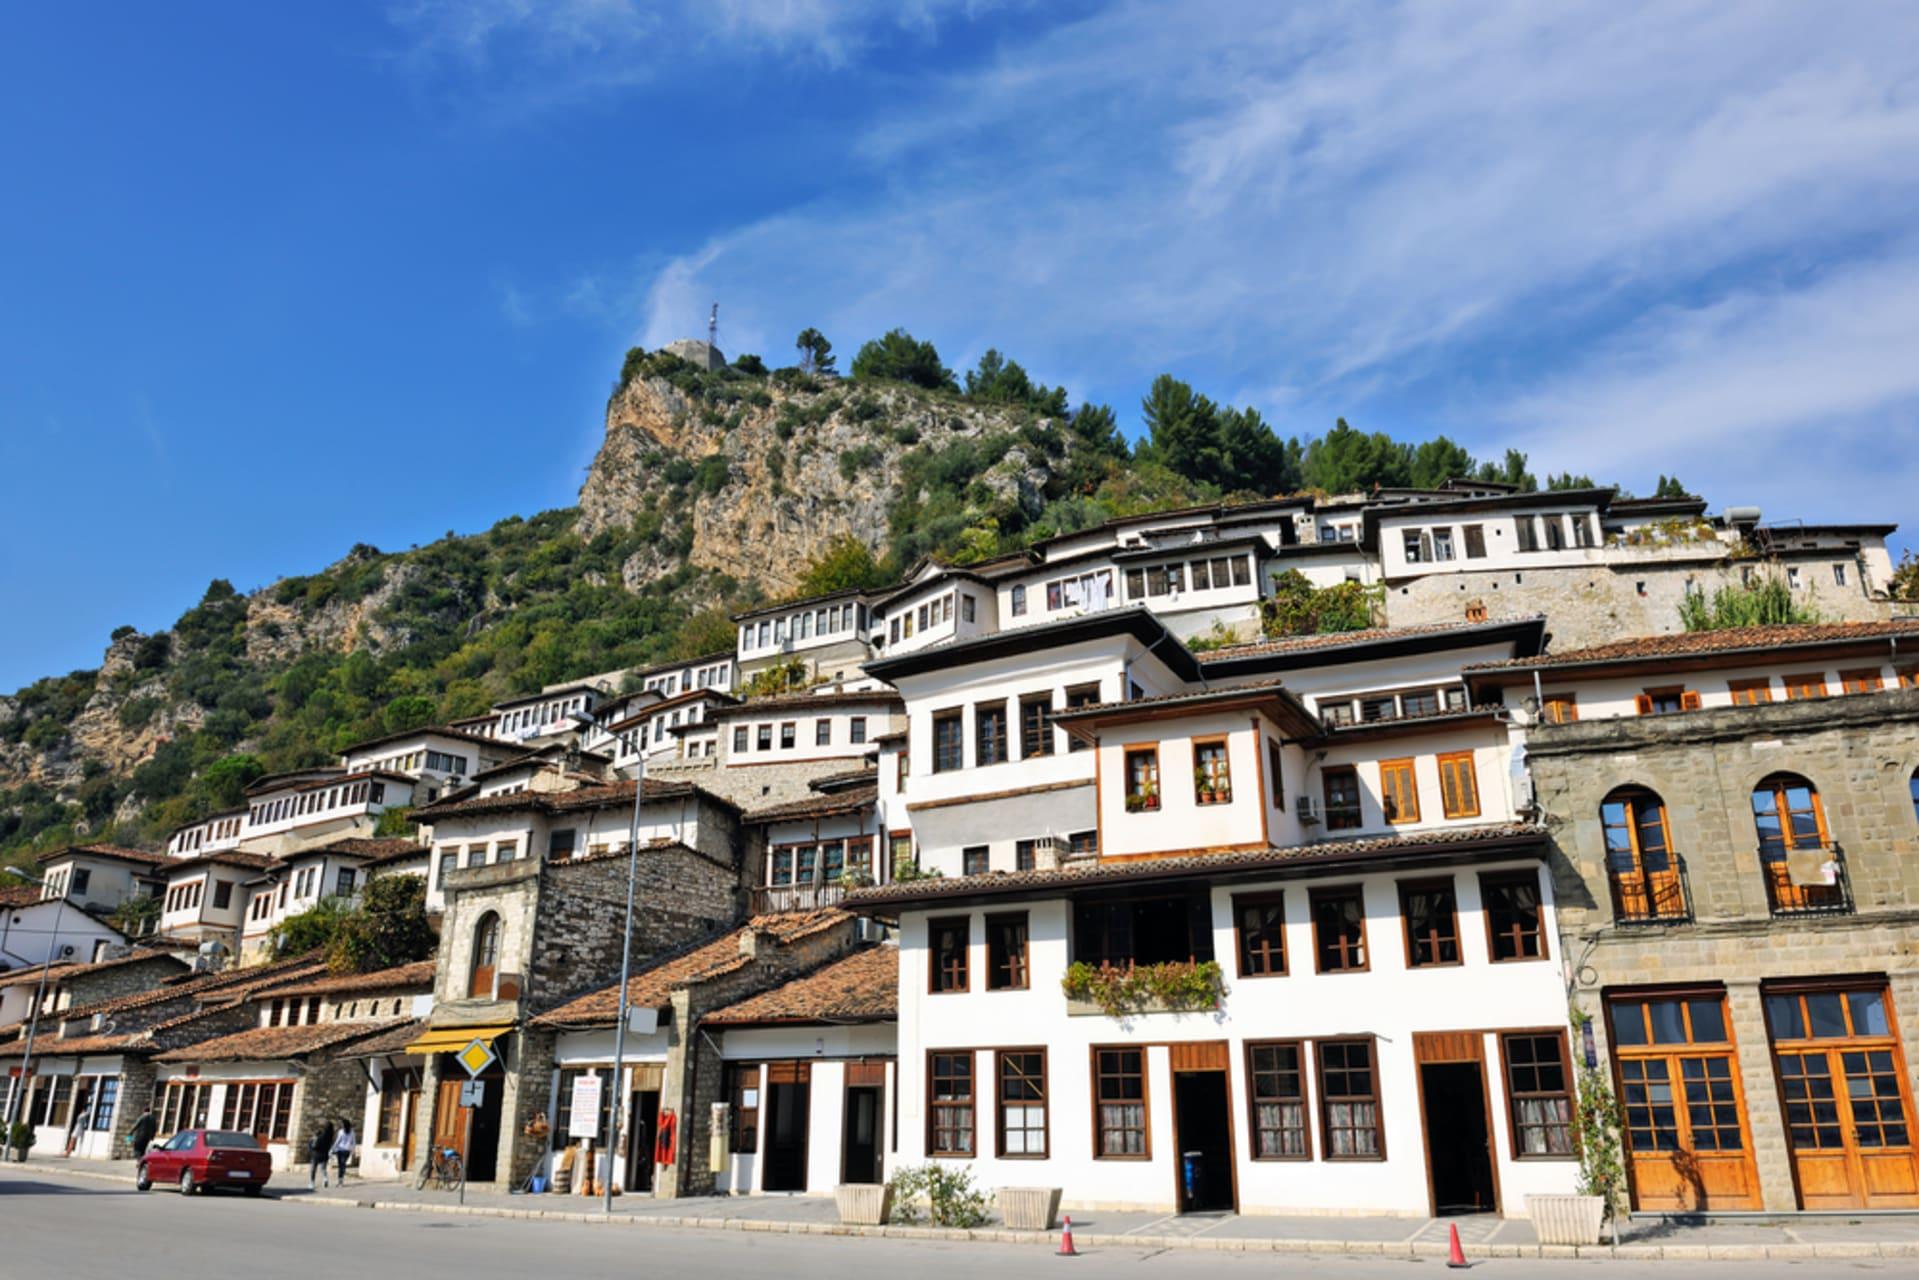 Berat - City of 1001 Windows - Neighborhoods of Mangalemi and Gorica - Part 2